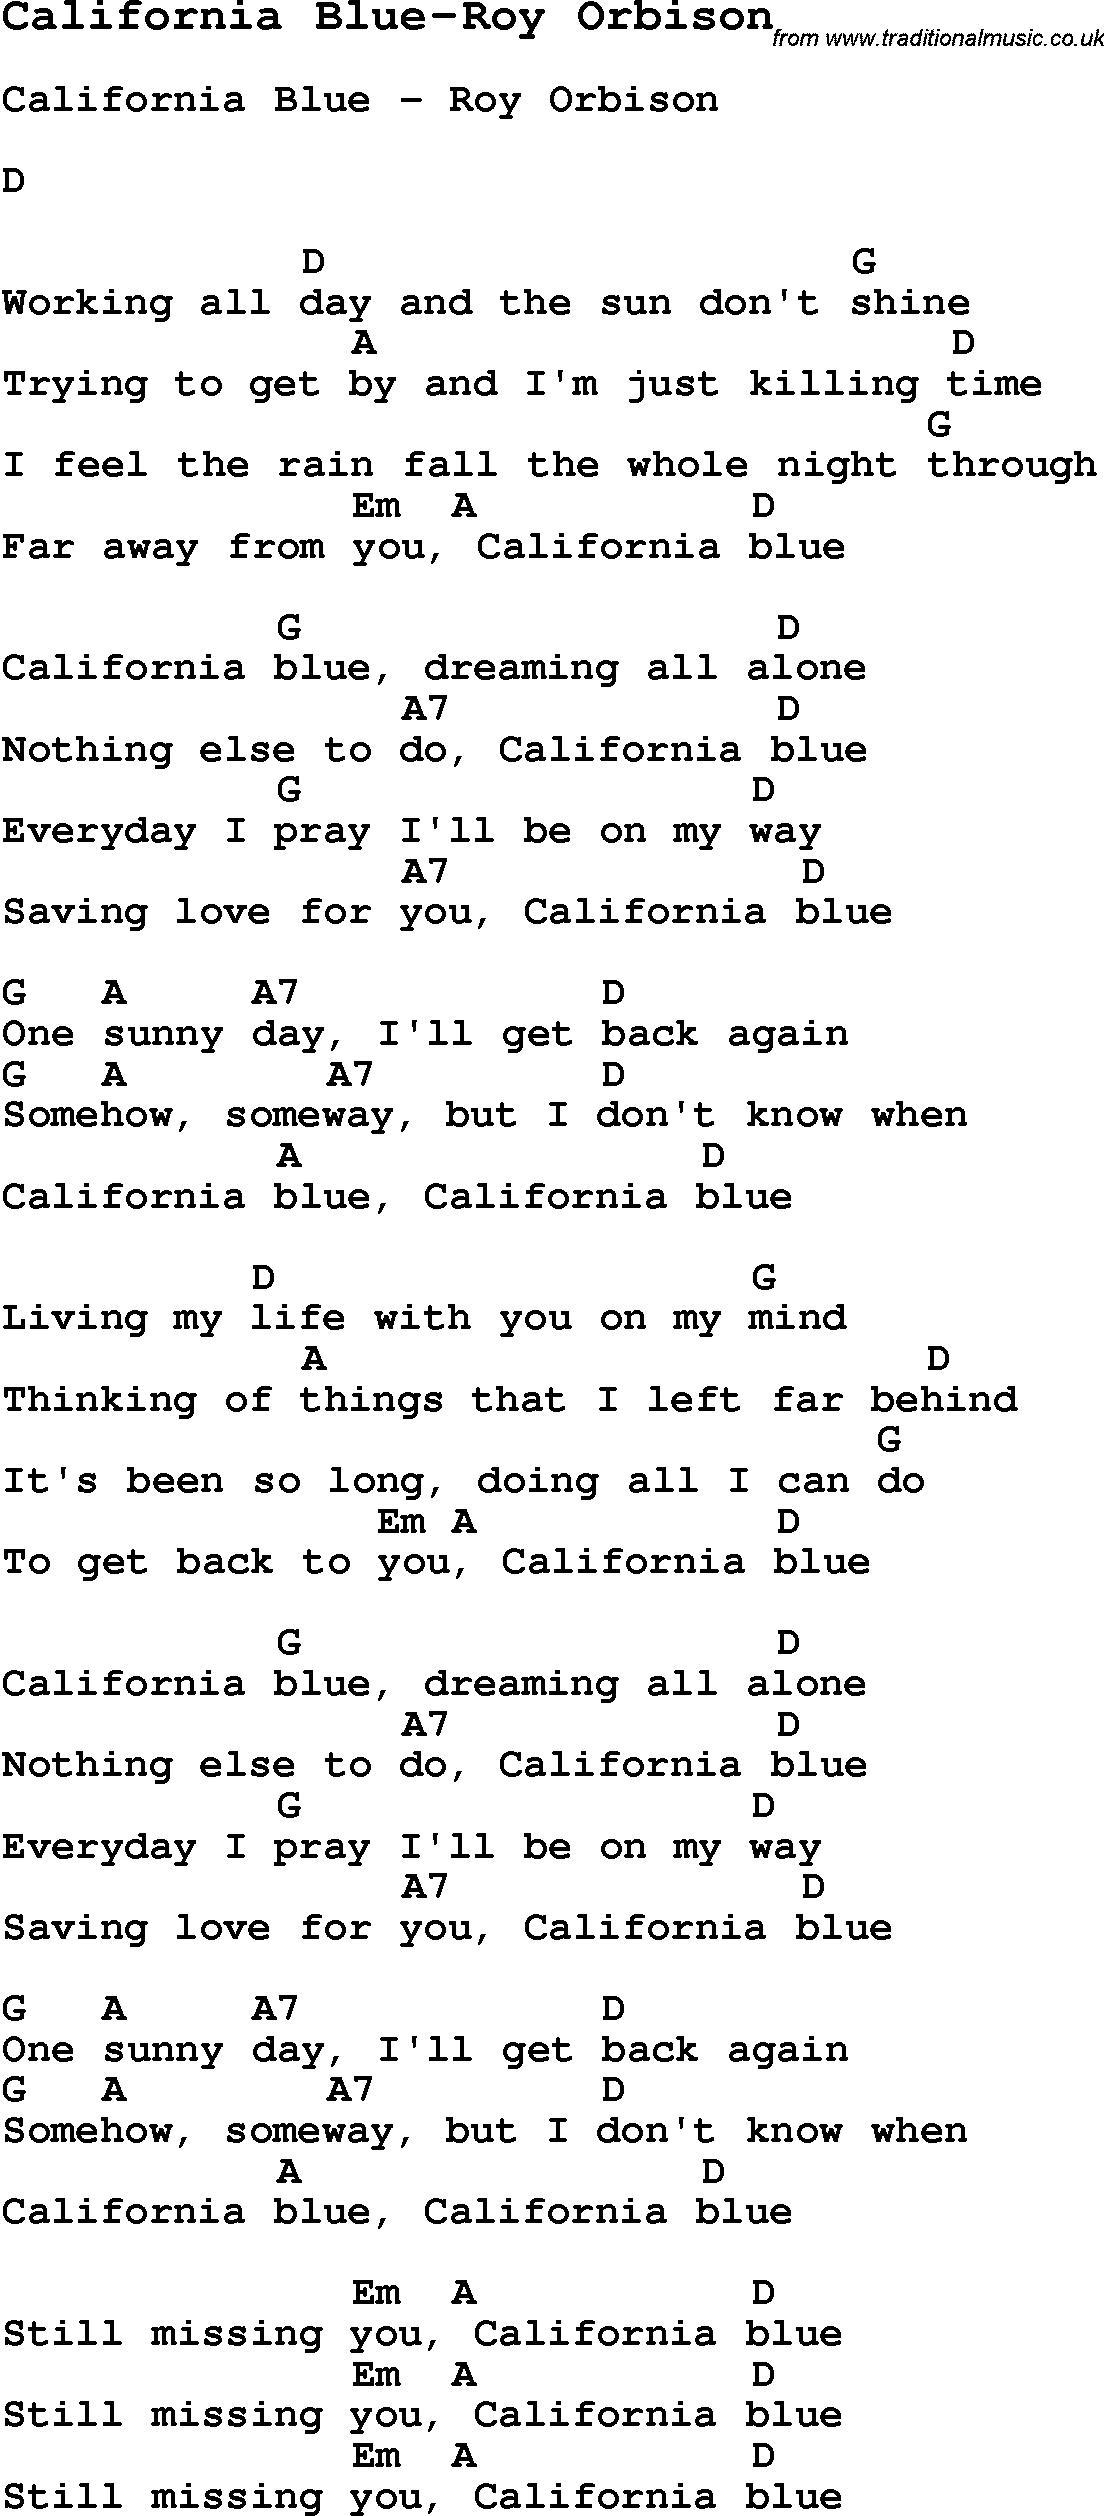 Blues Guitar Song, lyrics, chords, tablature, playing hints